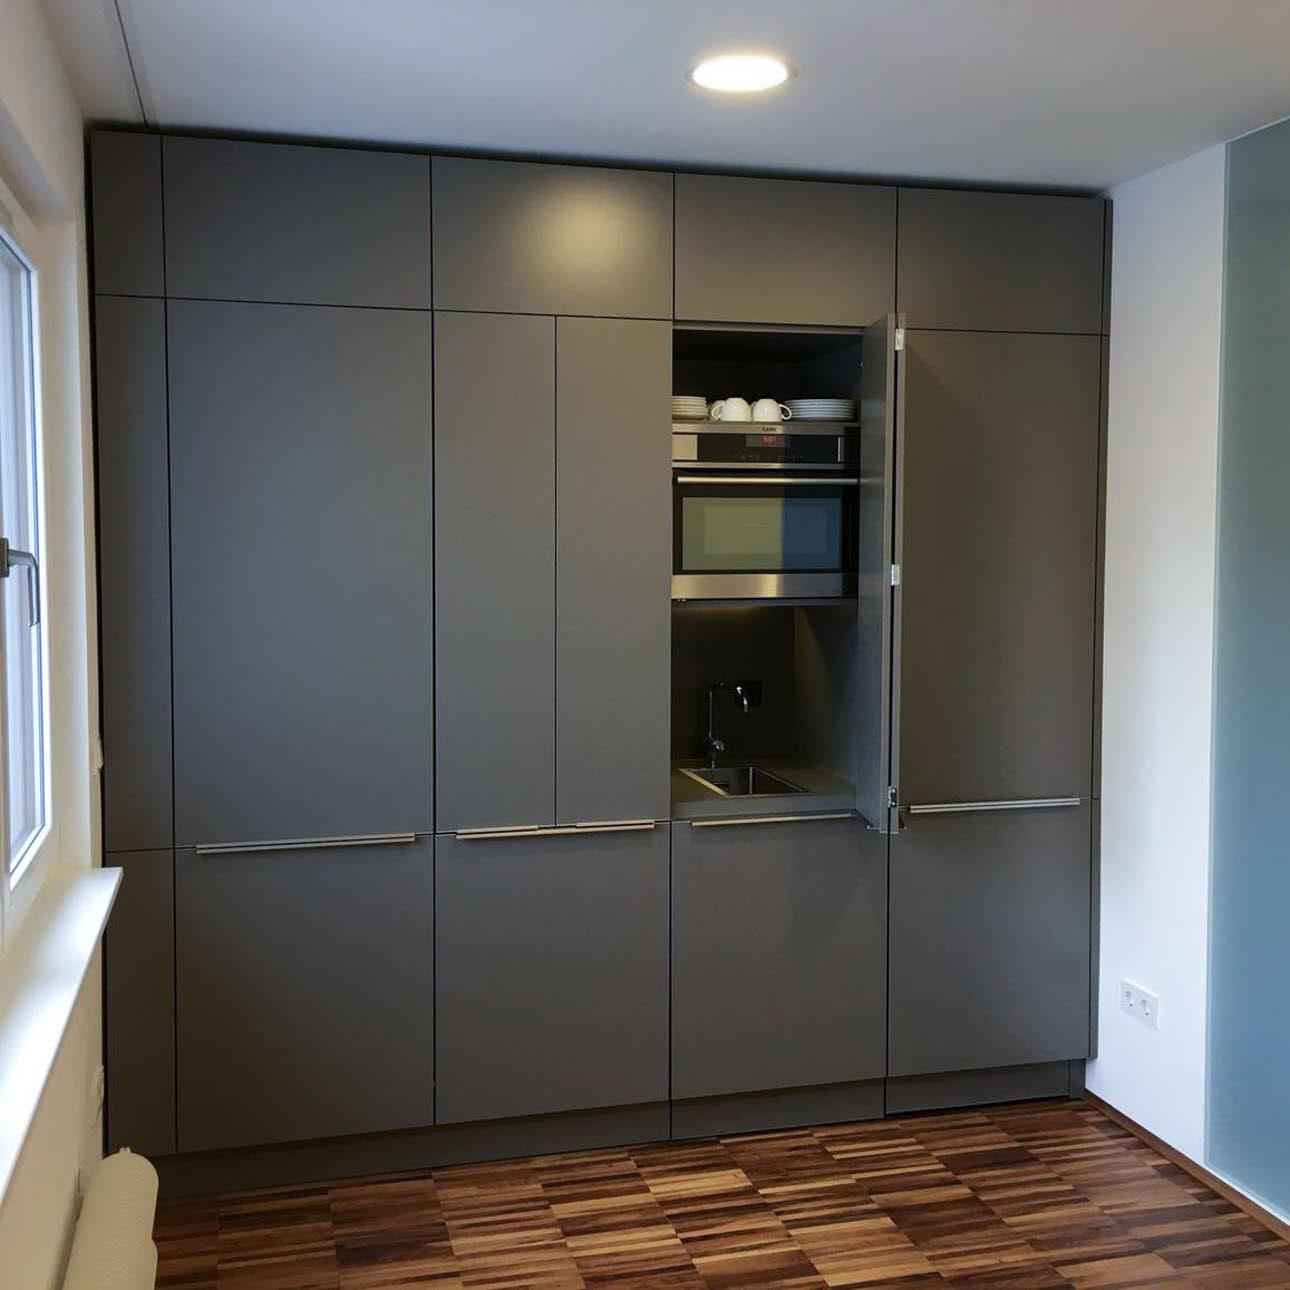 ewe k chen i magazin i raumwunder kleine k che ganz gro. Black Bedroom Furniture Sets. Home Design Ideas